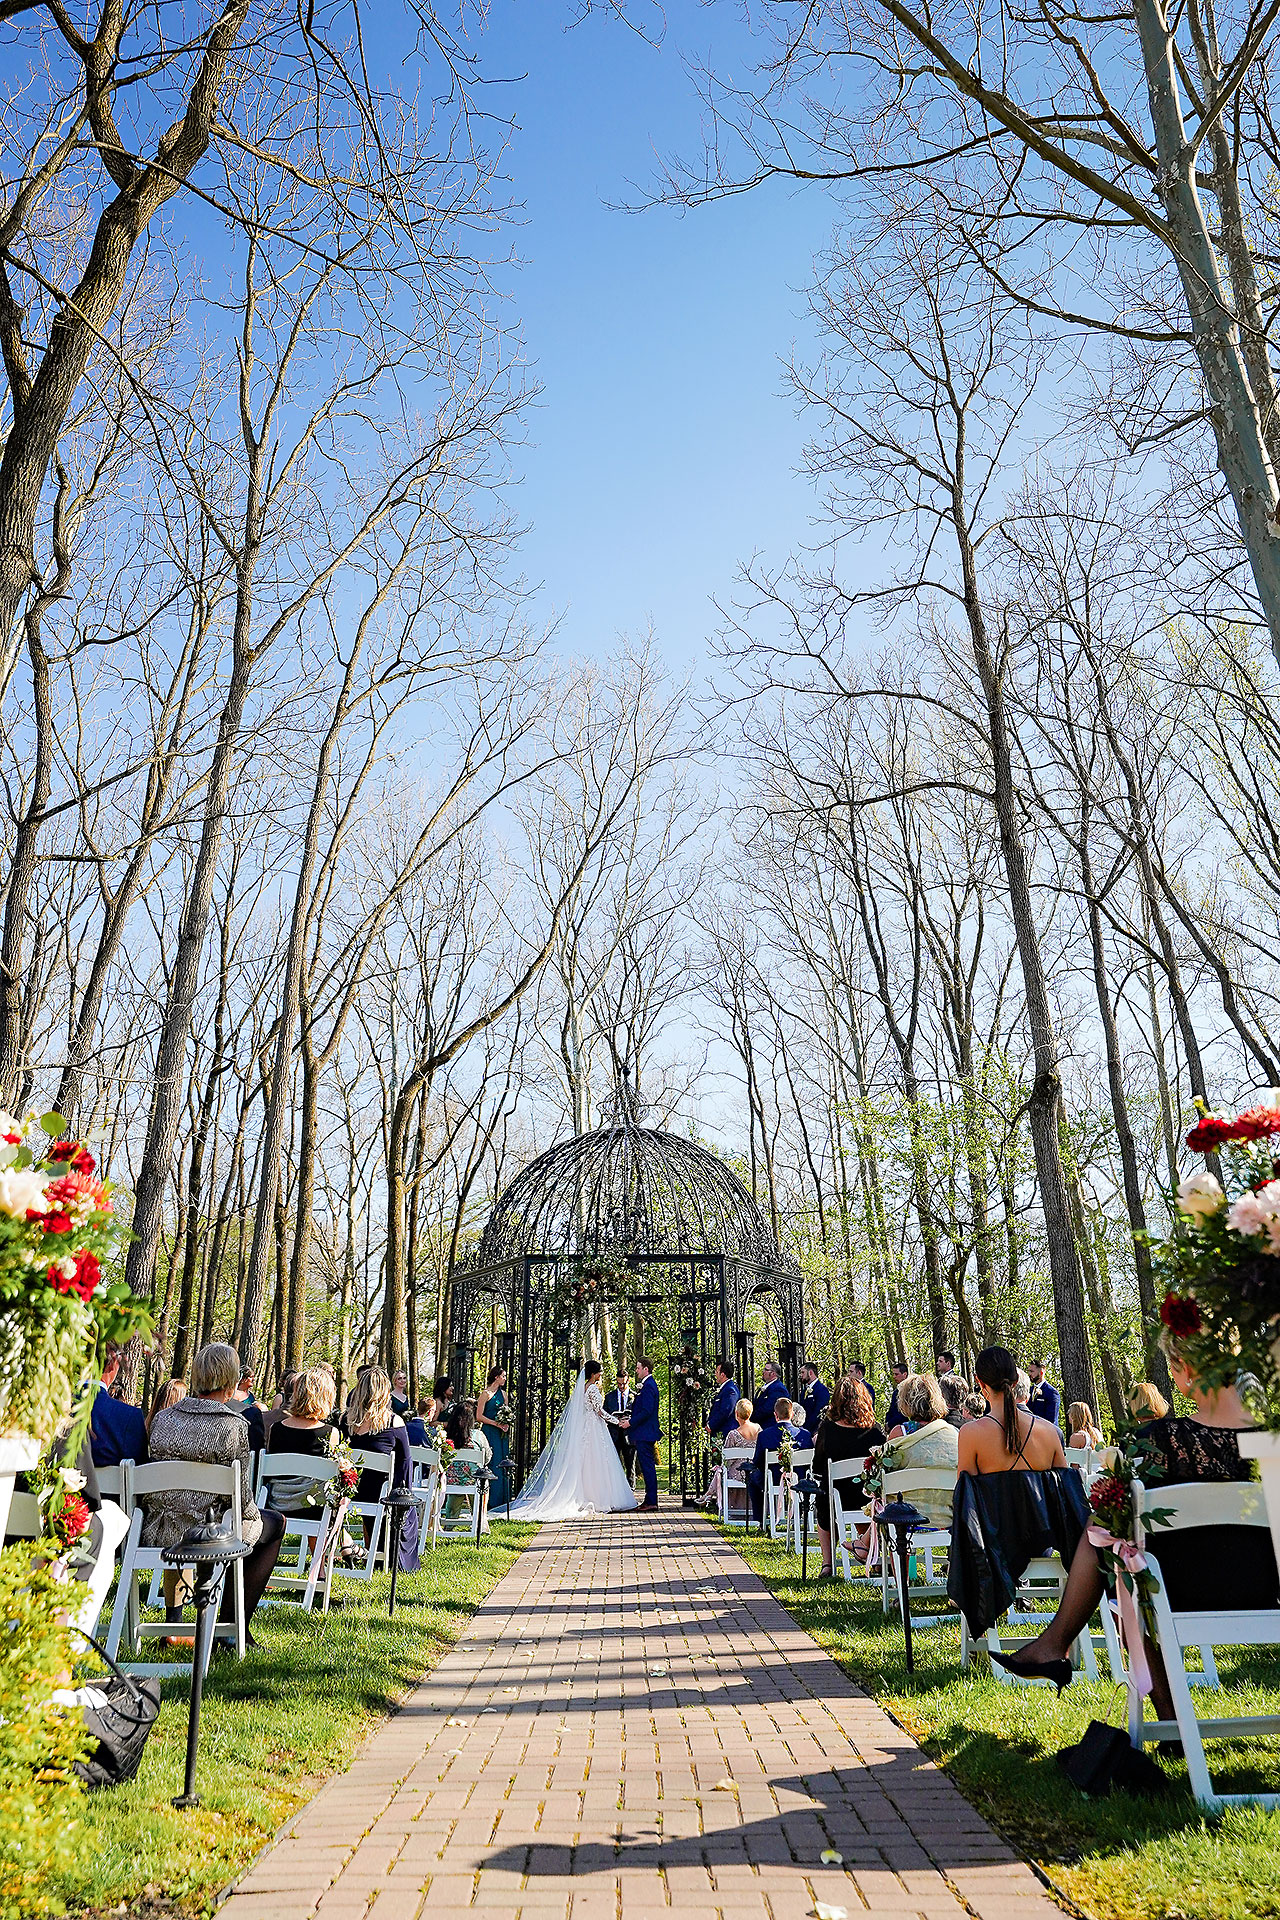 Nadia Parker Black Iris Estate Carmel Indiana Wedding May 2021 176